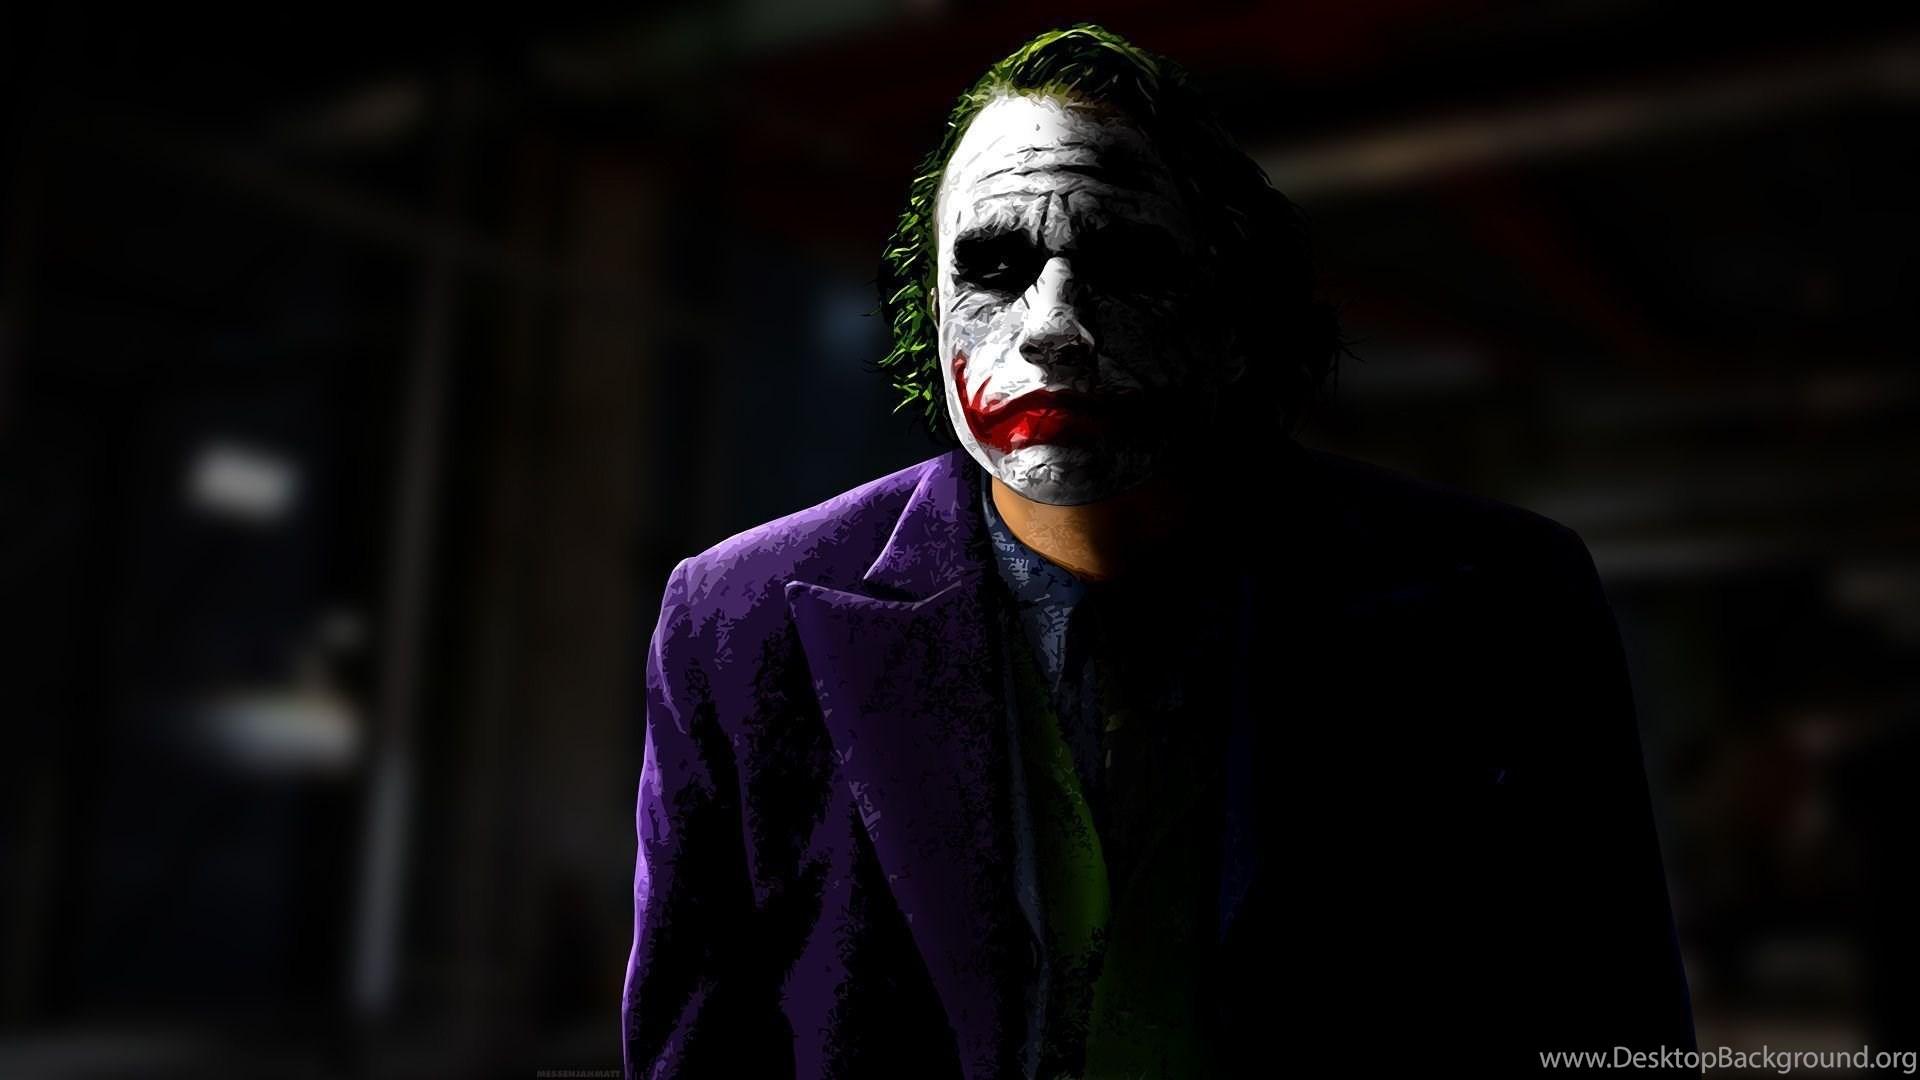 Dark Knight Joker Wallpapers Desktop Background